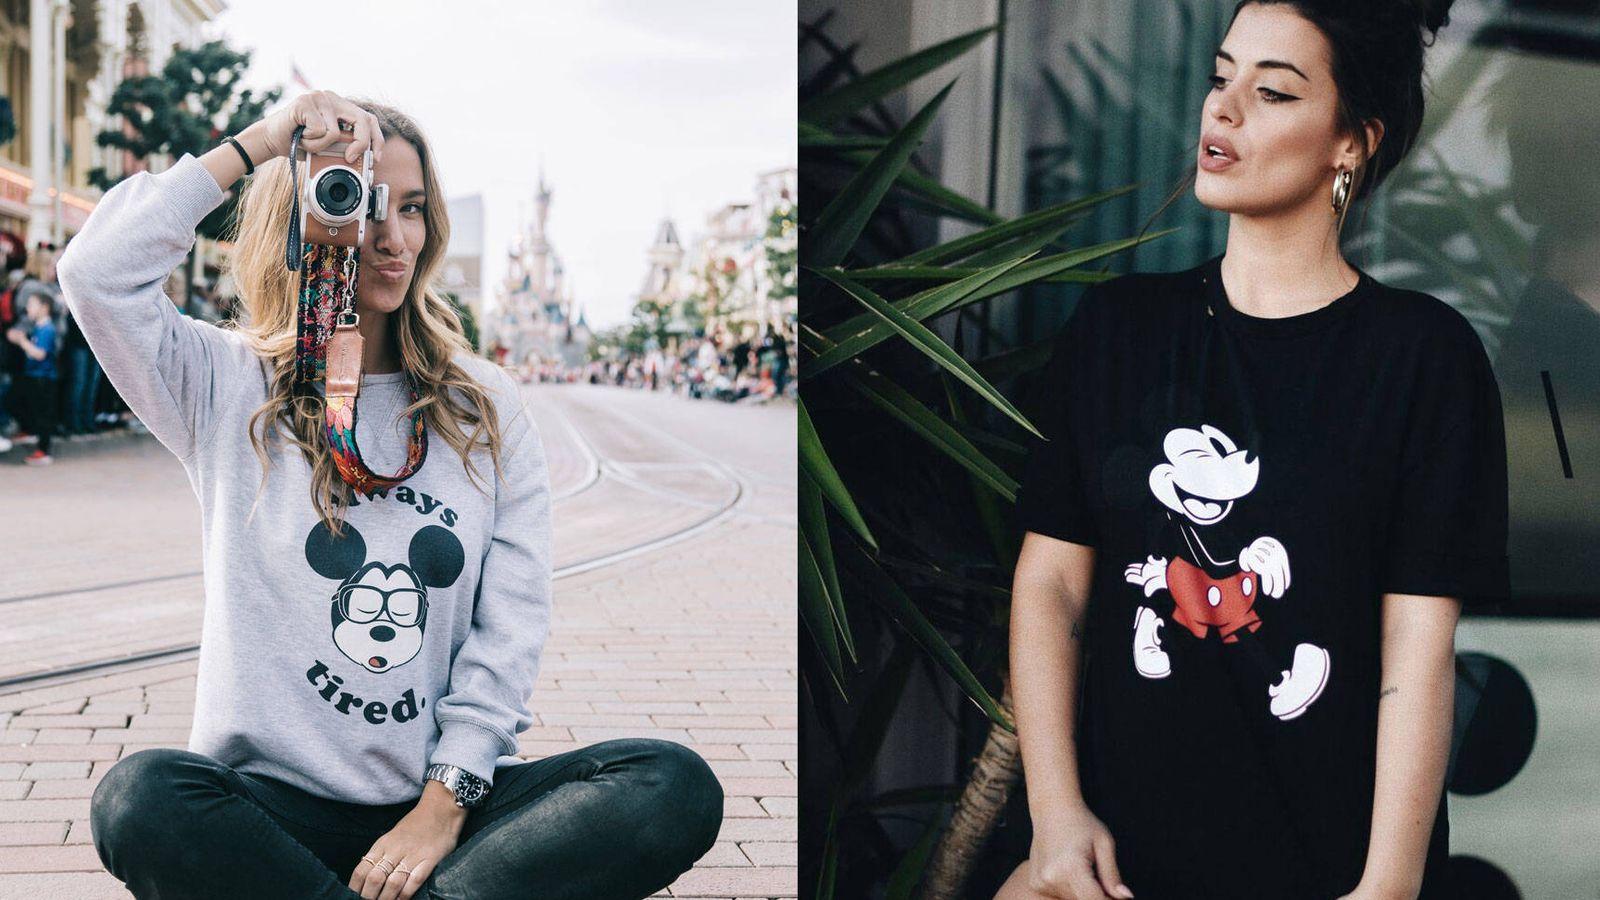 Foto: De izq a dcha: María Pombo con sudadera de Tipi Tent con motivo de Mickey Mouse y frase (45 €) y Aida Domenech con camiseta negra de Dulceidashop (25 €). (Cortesía)